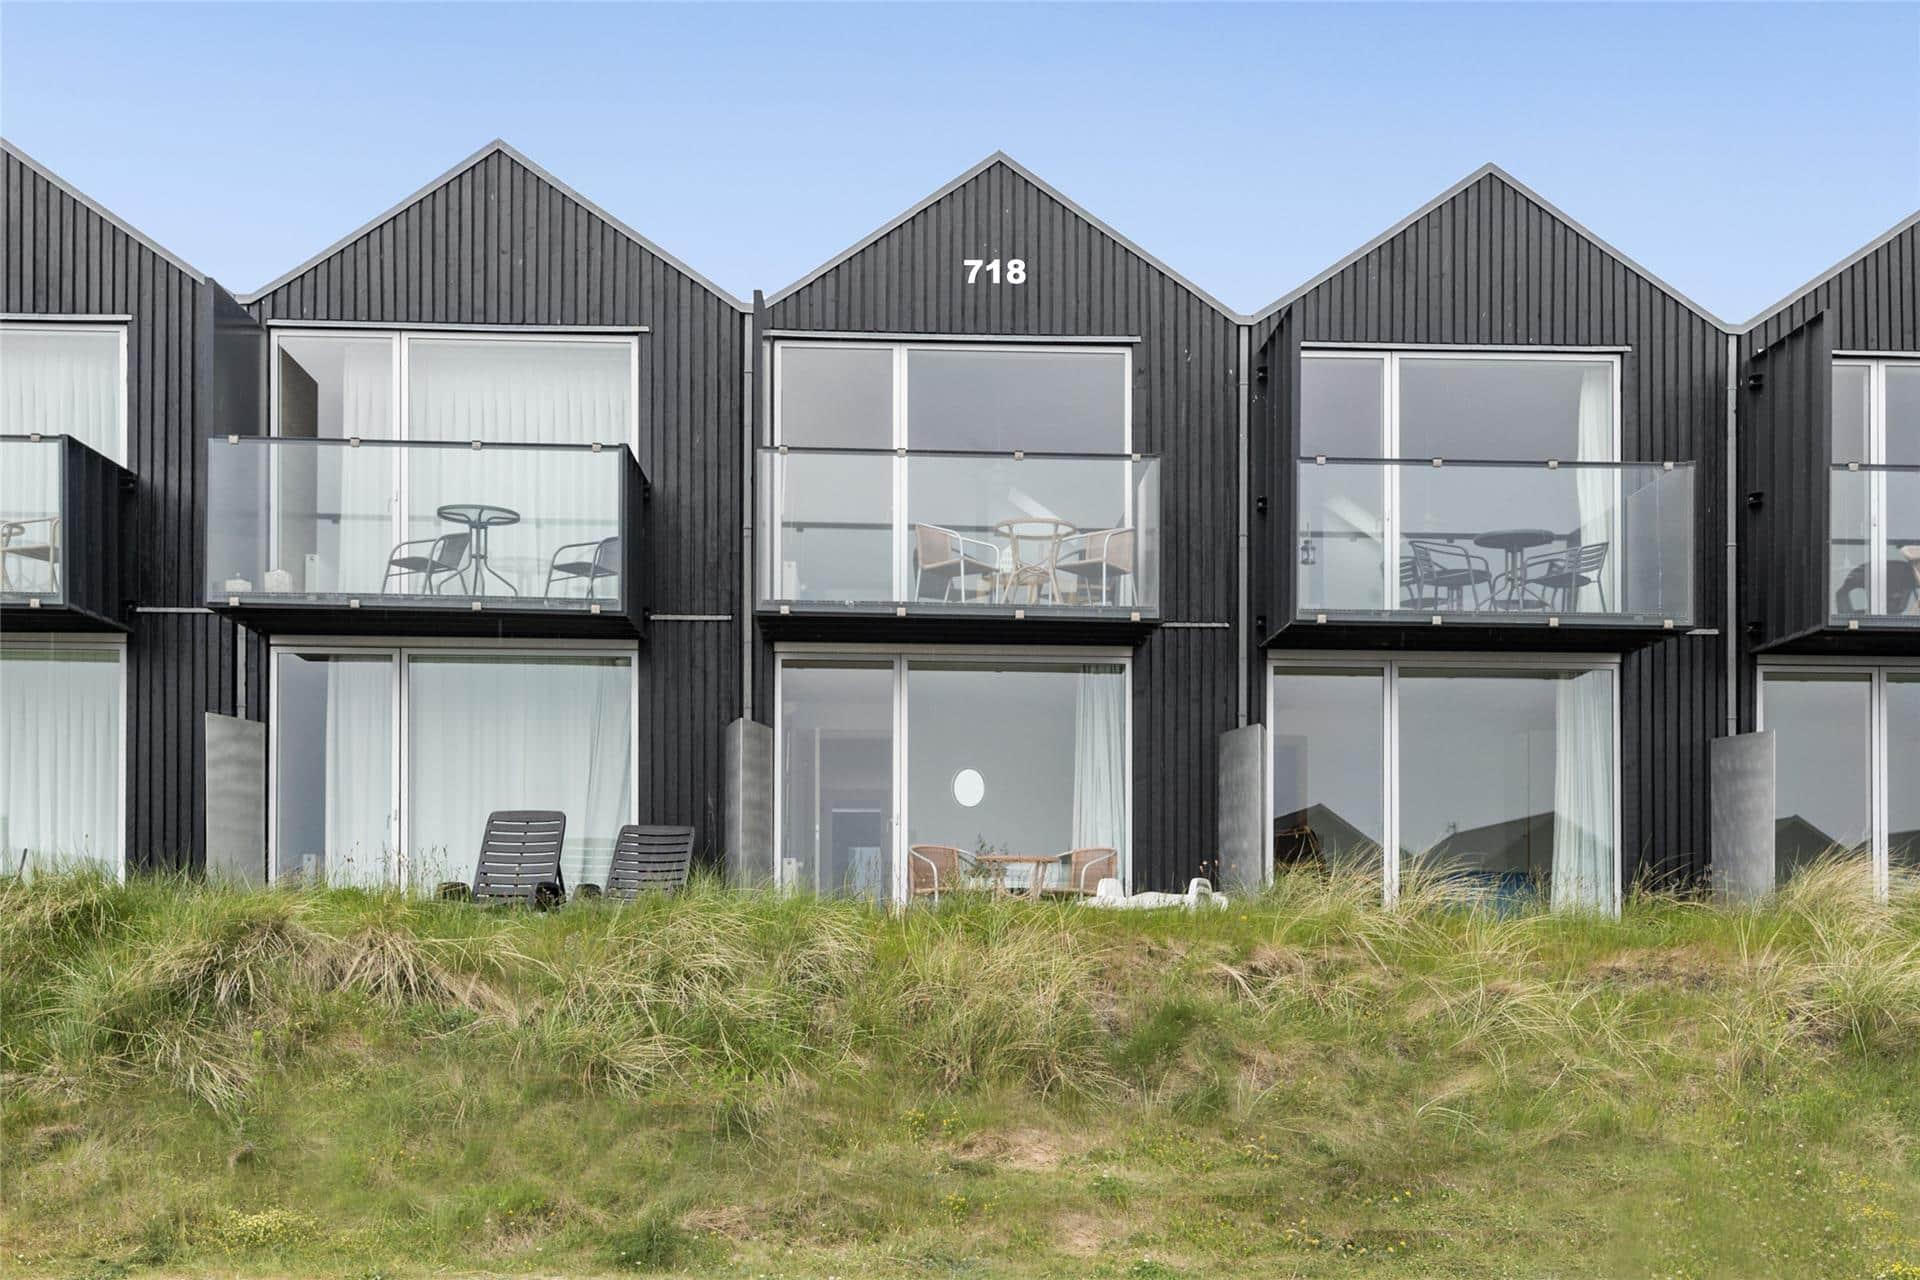 Bild 1-4 Ferienhaus 718, Slusen 18, DK - 6960 Hvide Sande